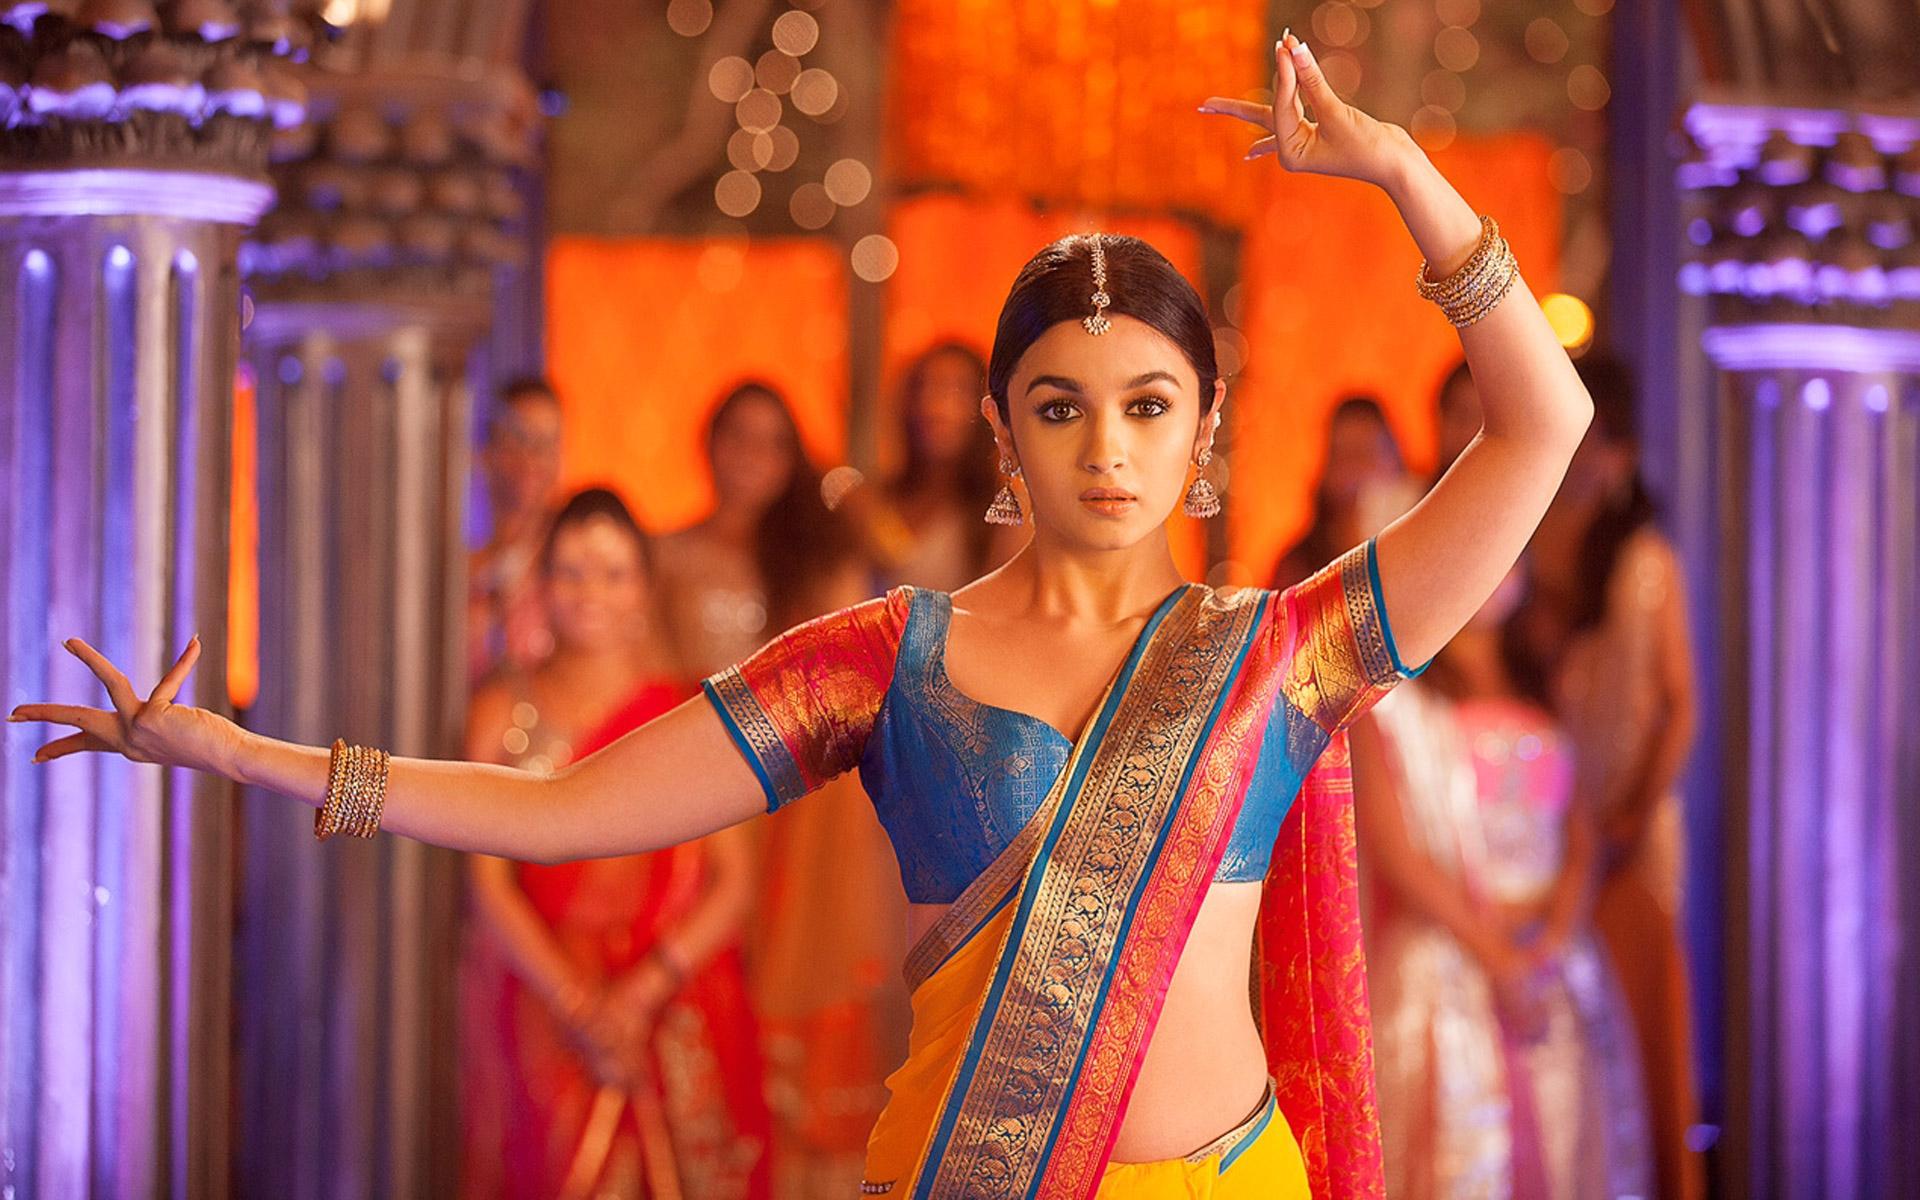 Bollywood film stars photos Bollywood Actresses Bikini Pics 2018 Topless Photos Hot